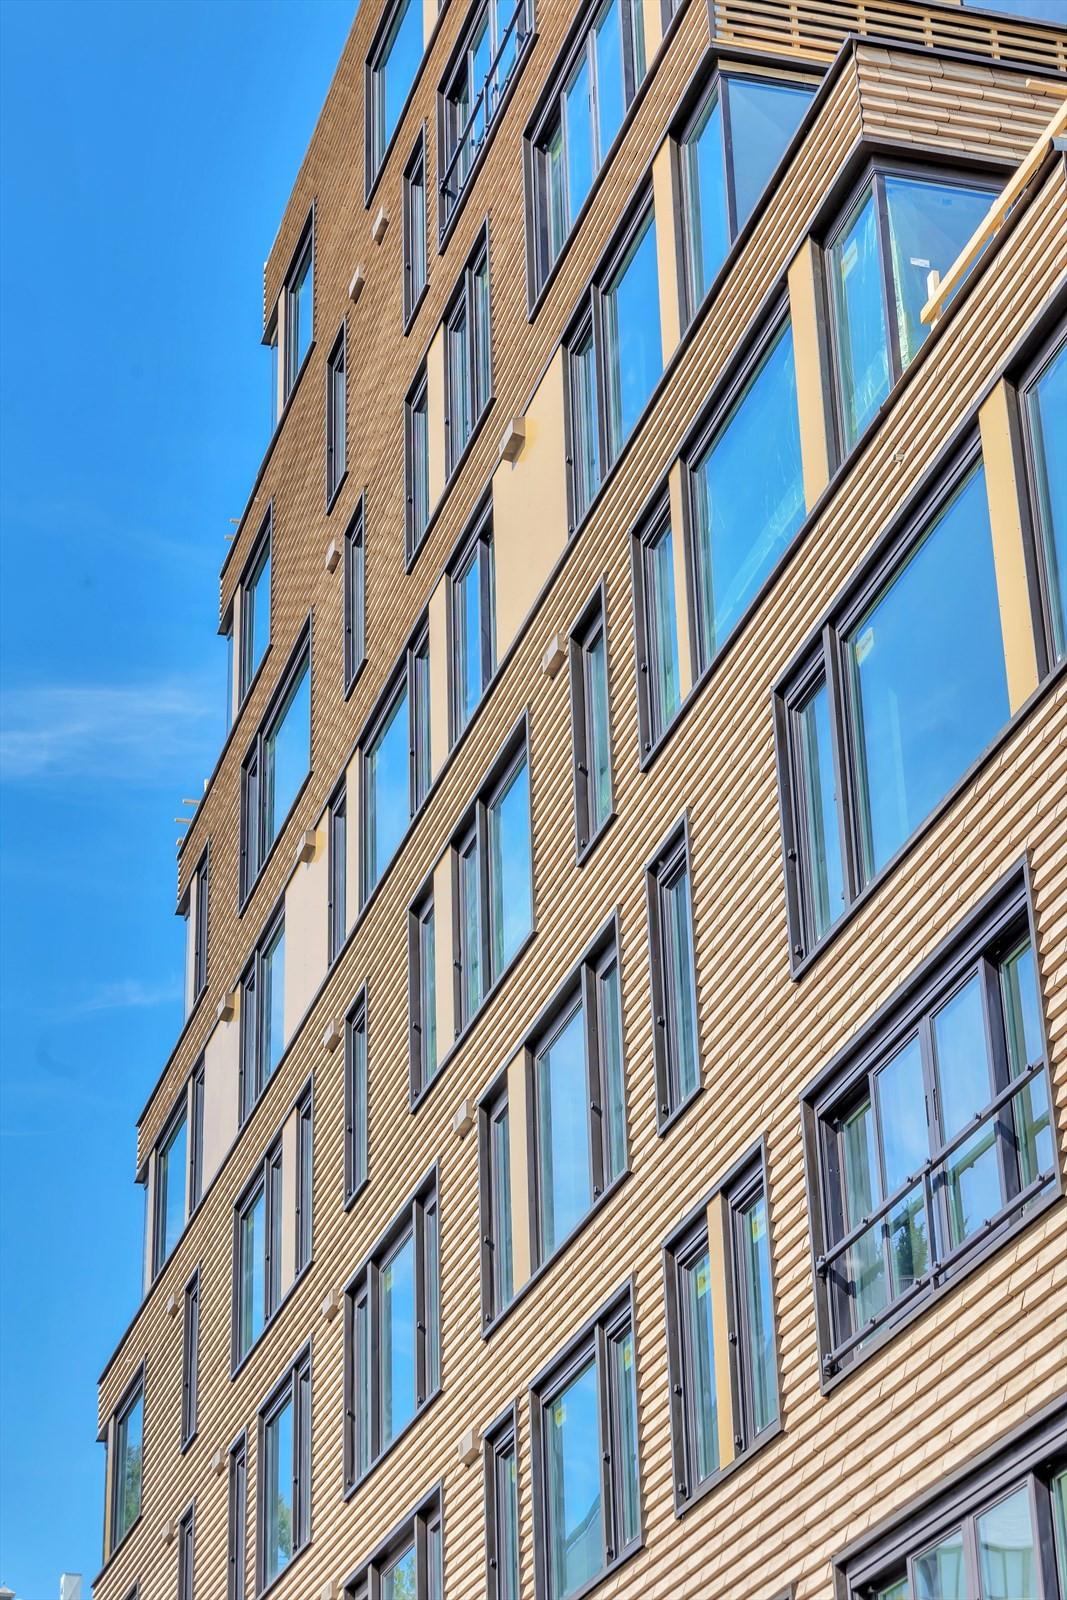 Teglsteins fasade